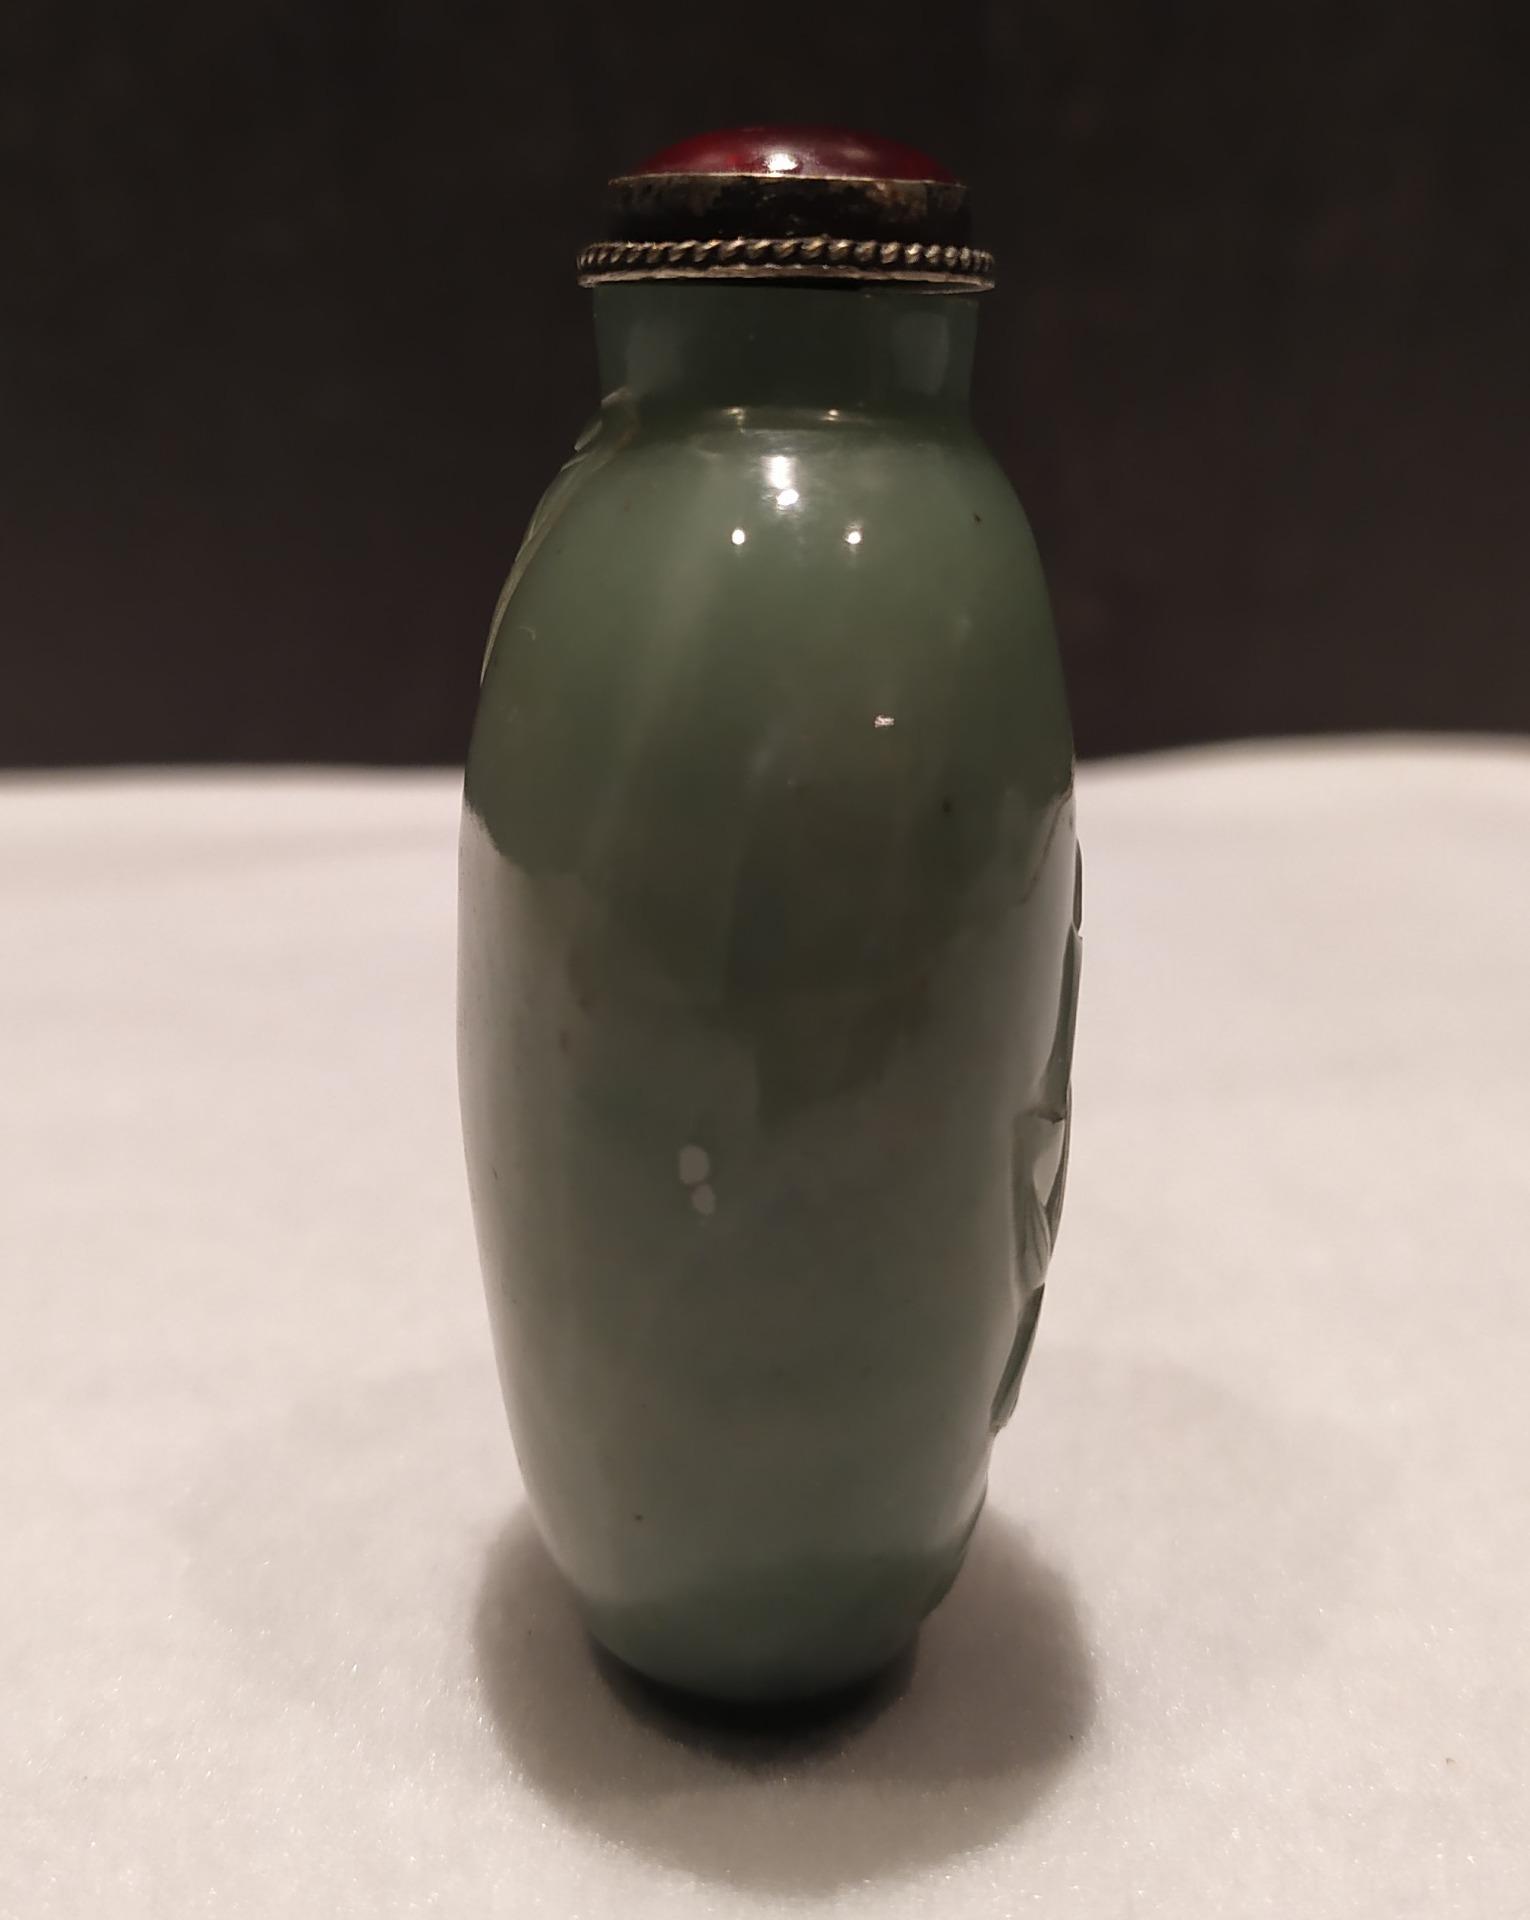 thumb3|Snuff bottle, porta tabacco fiuto, giada verde motivi floreali, Cina XX secolo